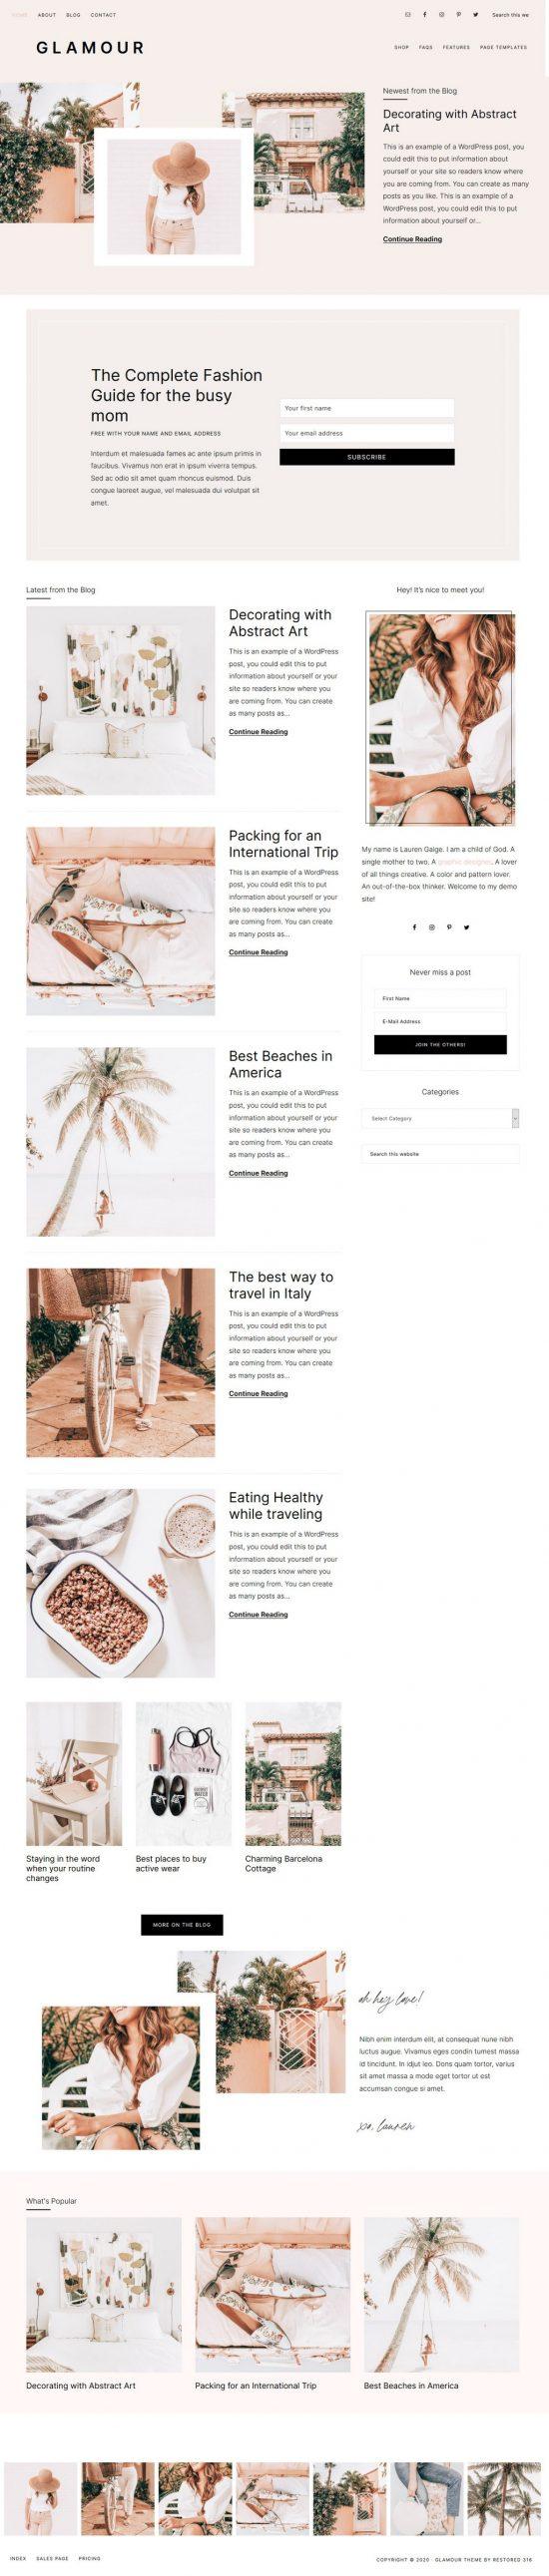 restored316designs glamour wordpress theme 01 550x2583 - Restored316Designs Glamour WordPress Theme